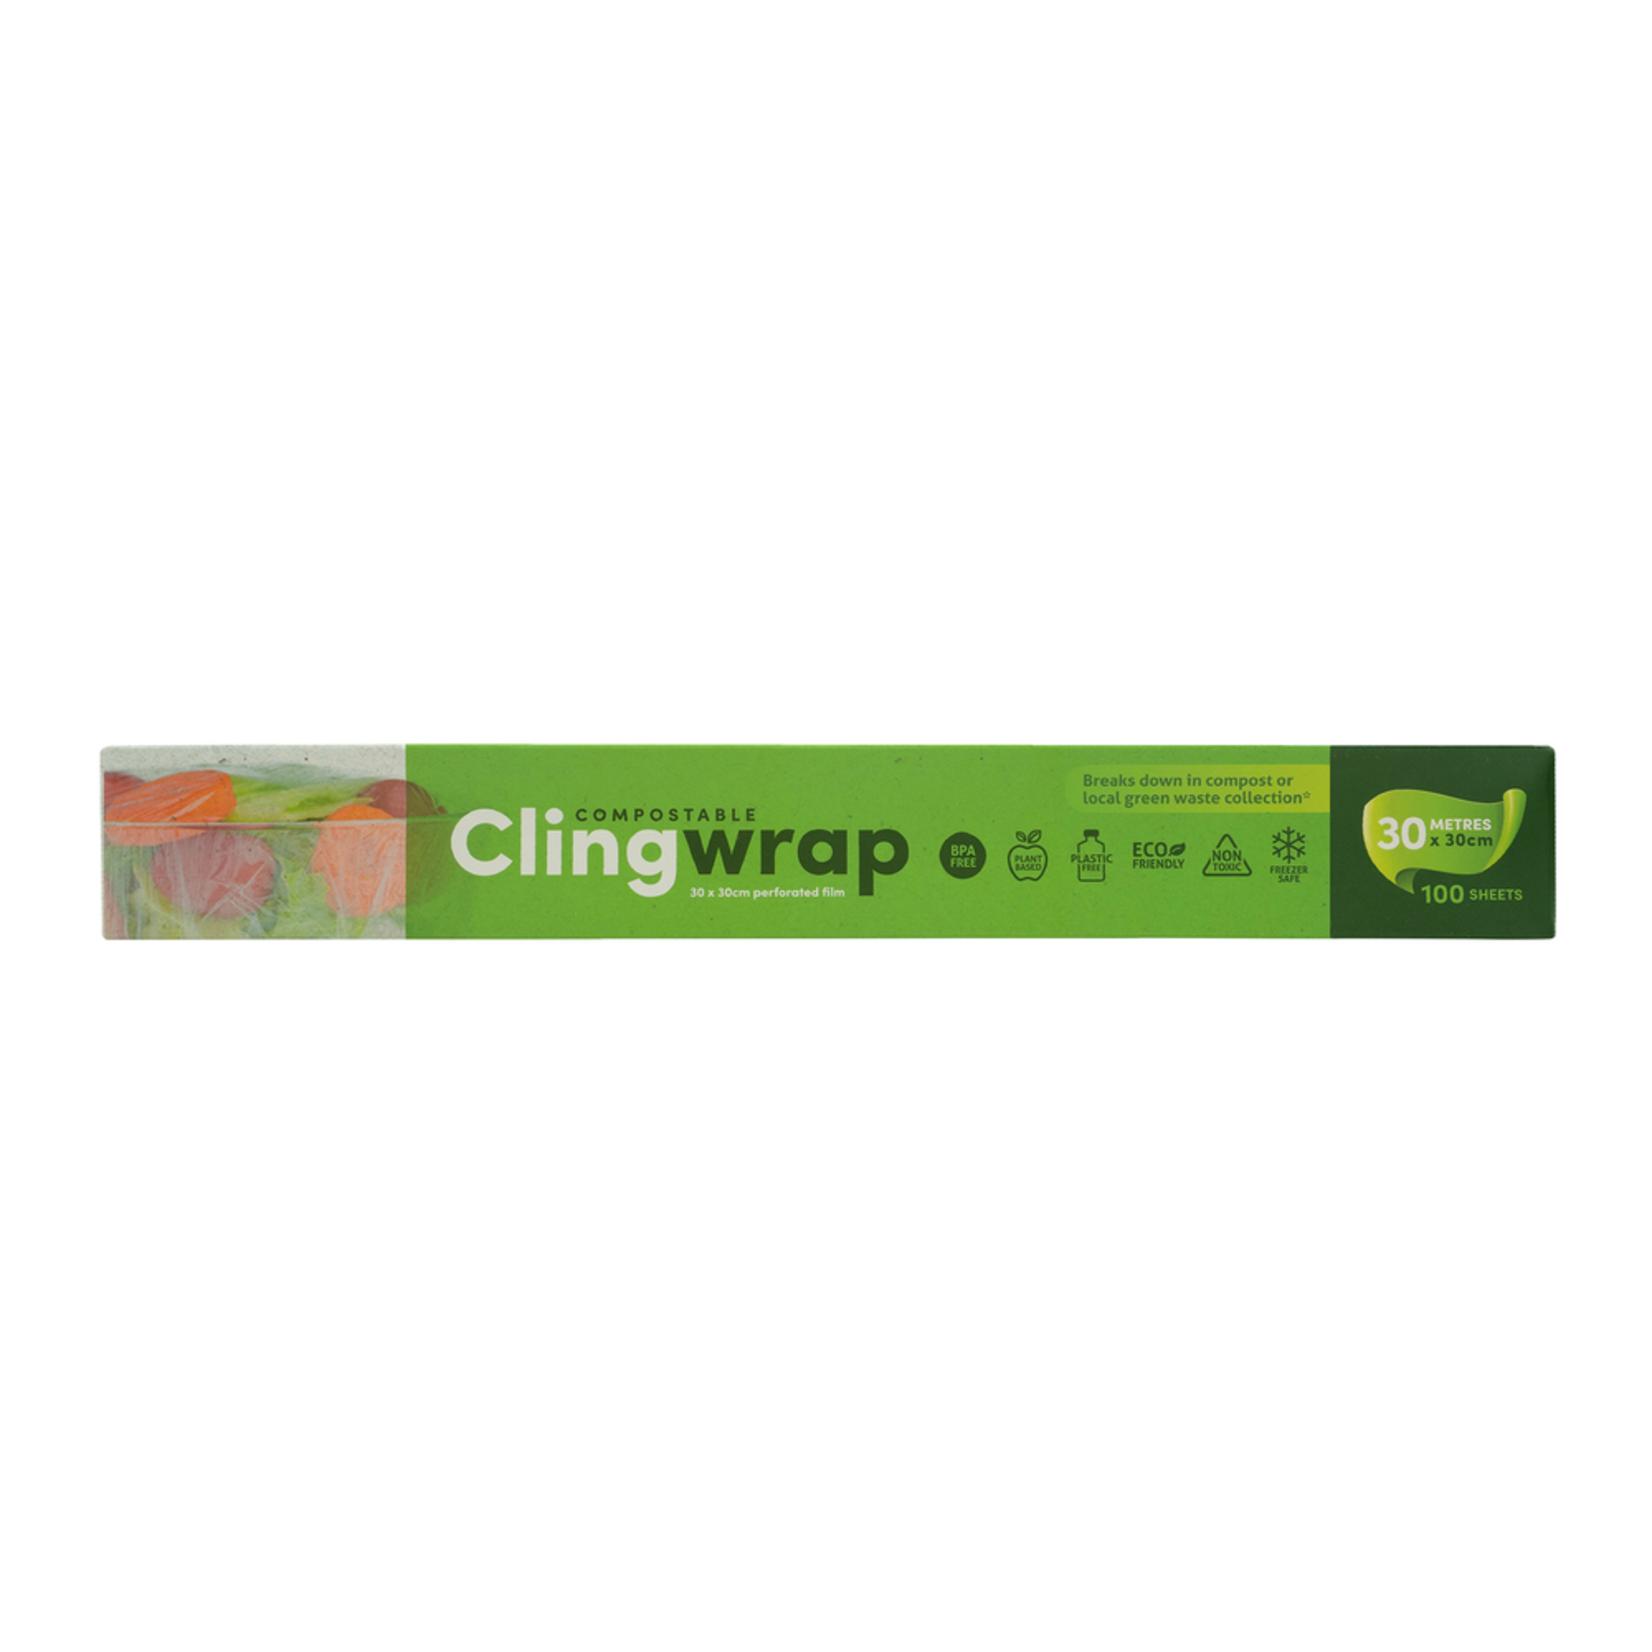 BioTuff Biotuff Compostable Clingwrap